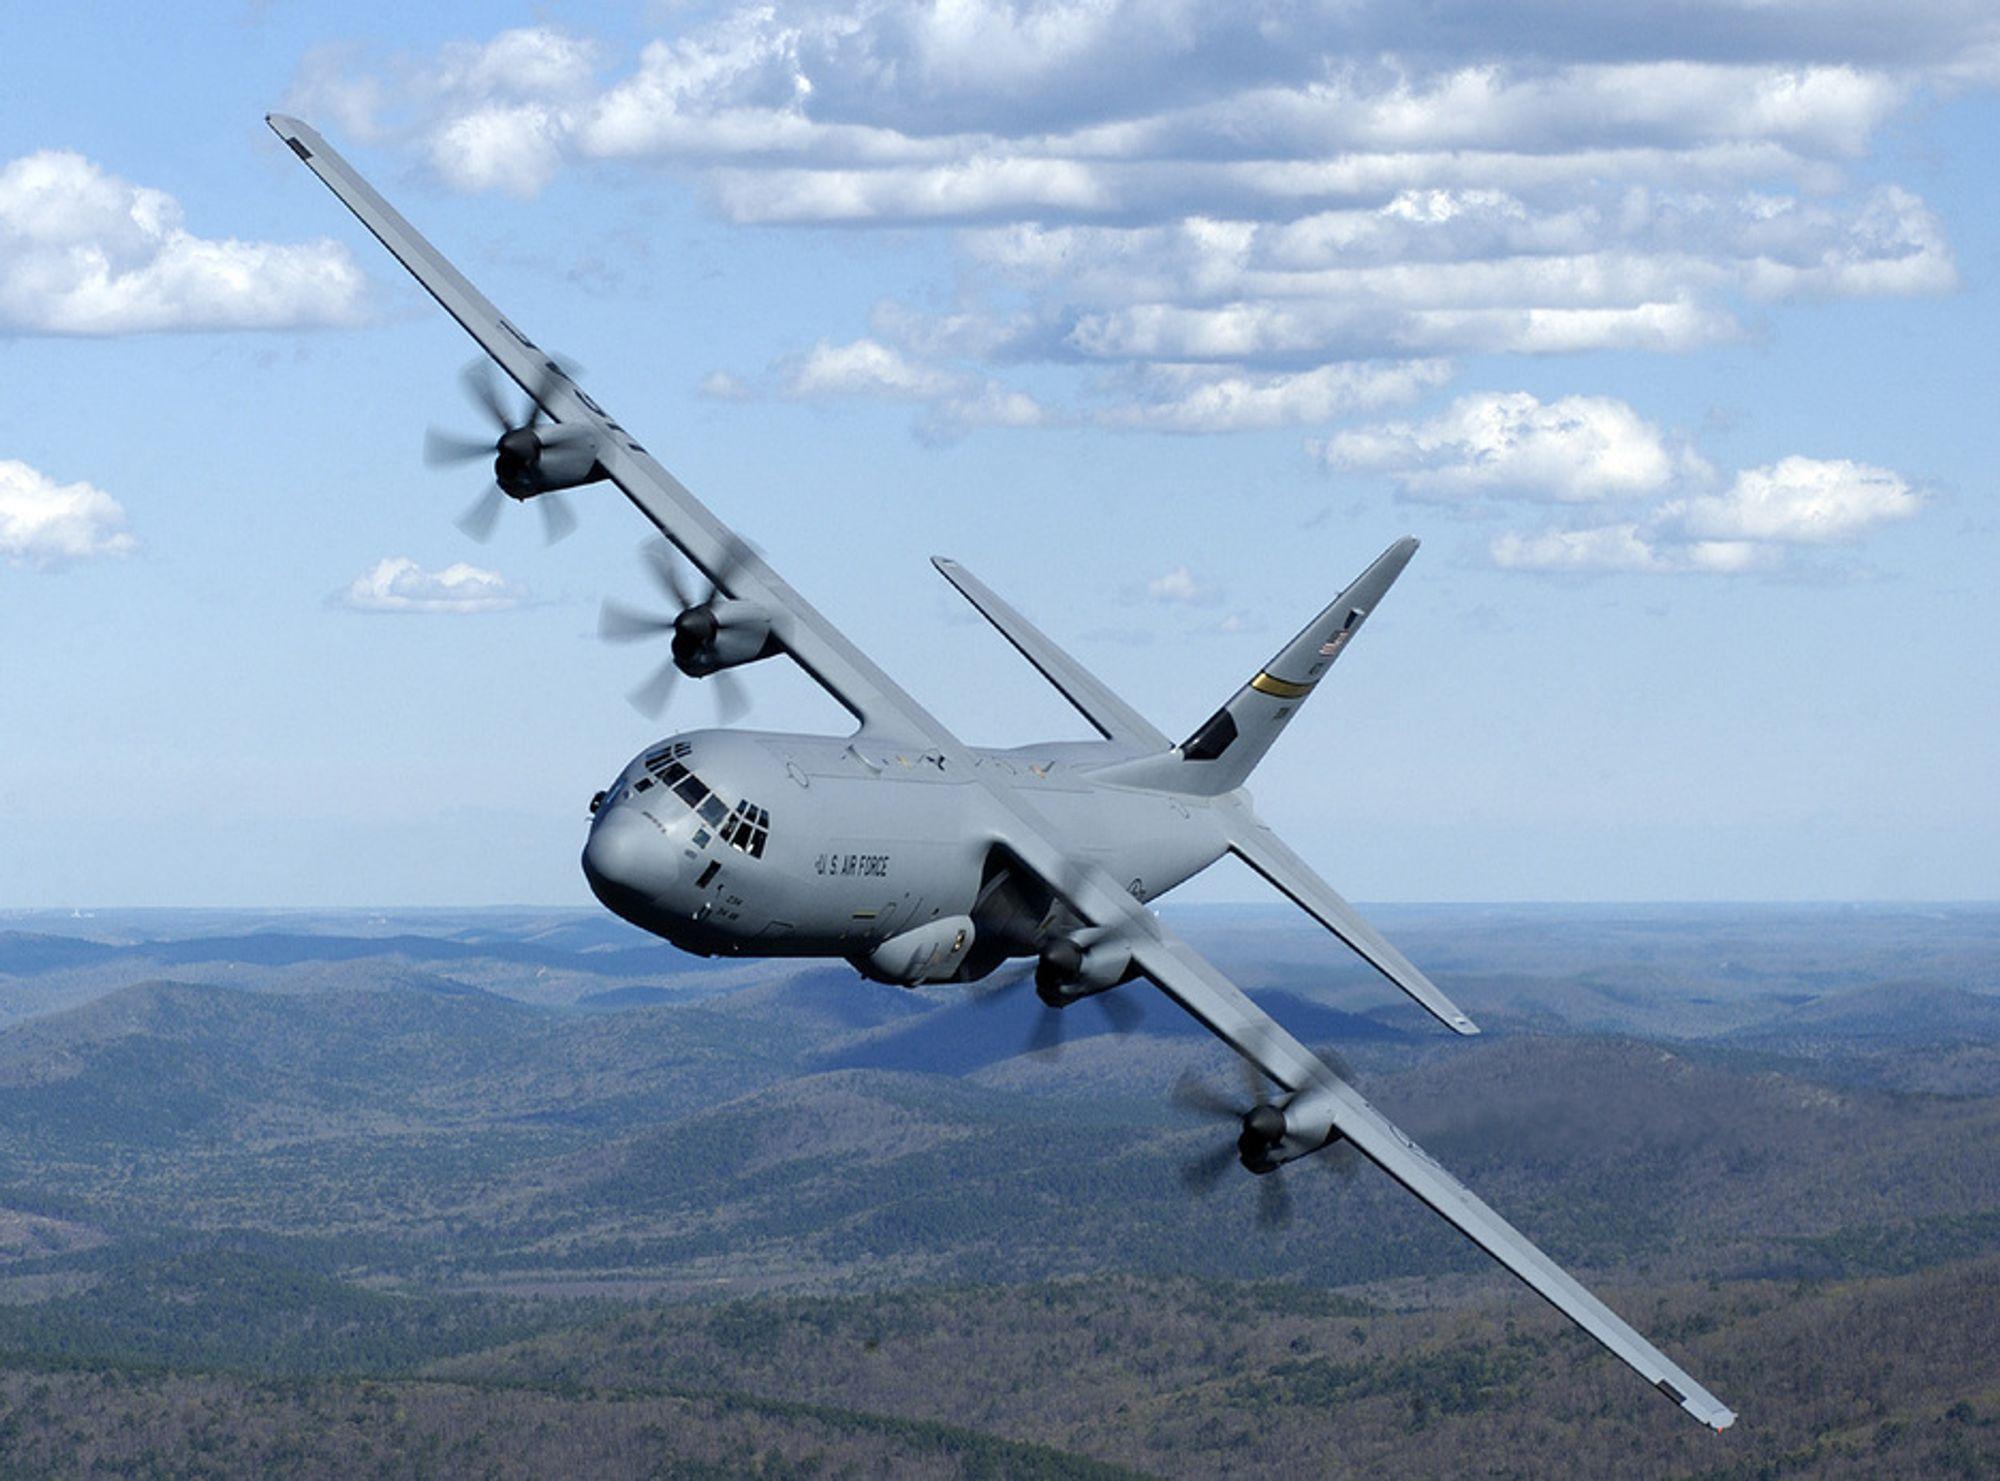 HASTEKJØP: Det norske Luftforsvaret kan få fire nye Hercules C 130J-30 fly i 2009, dersom regjeringen vil. Amerikanerne har sagt seg villige til å avse fire fly til Norge.